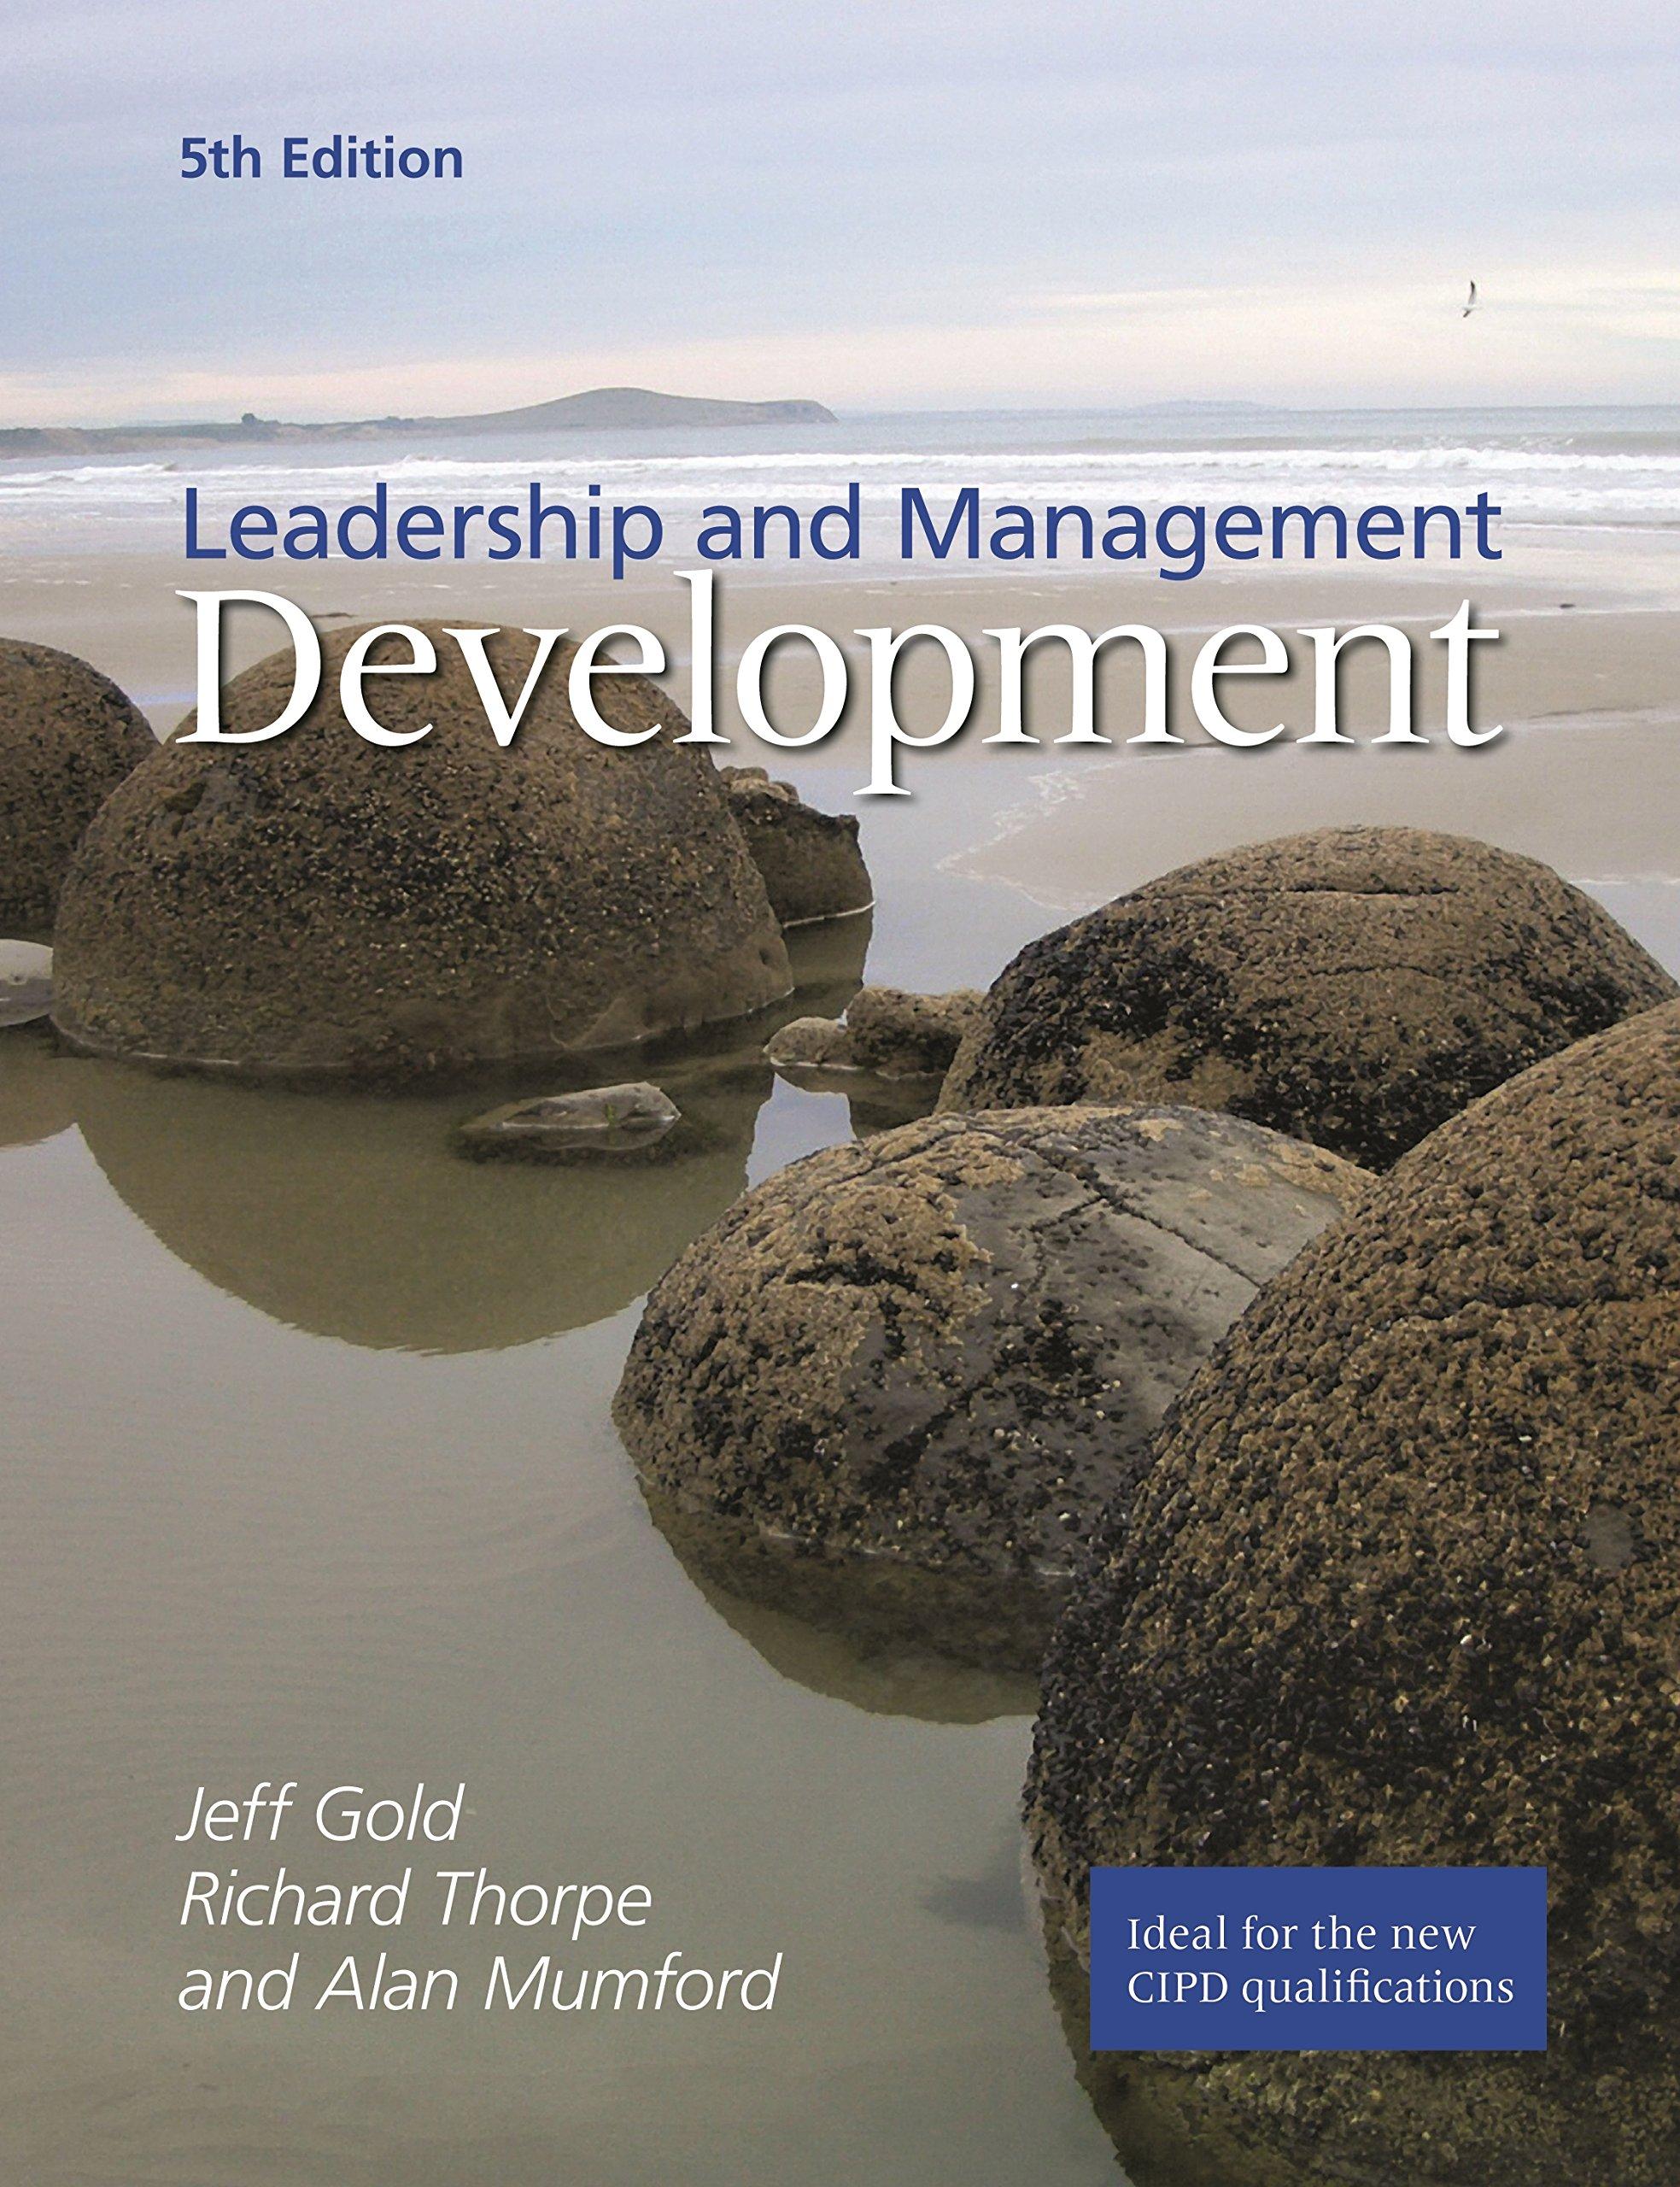 Leadership And Management Development: Amazon: Jeff Gold, Richard  Thorpe, Alan Mumford: 9781843982449: Books